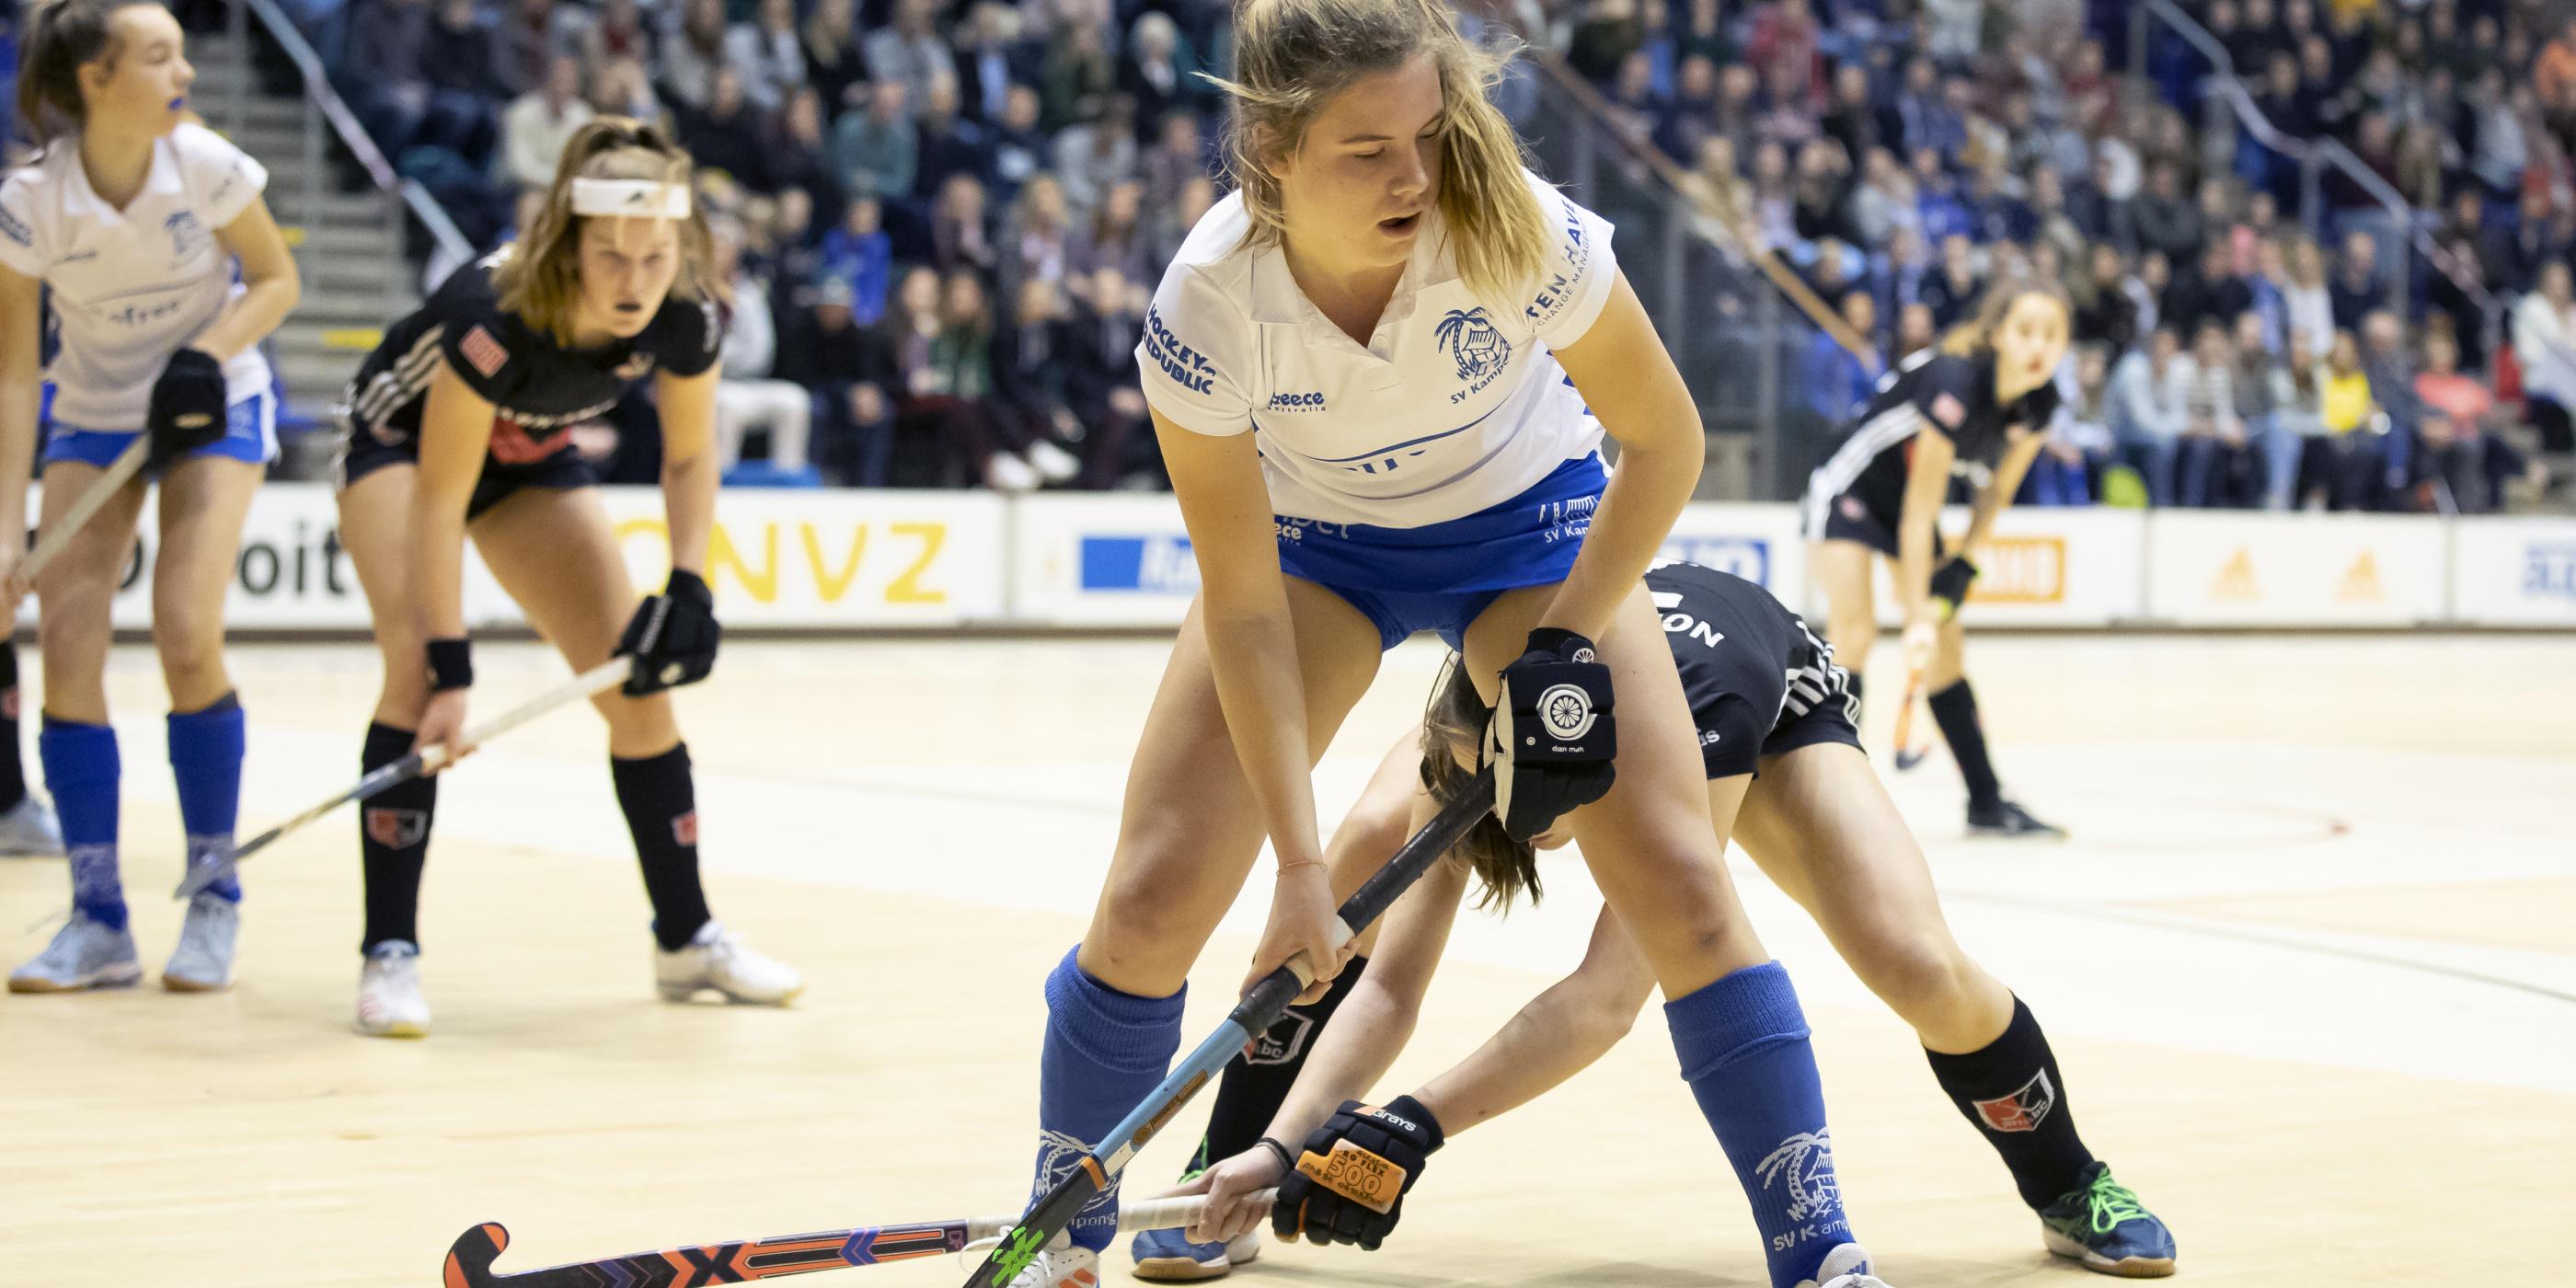 Nieuwe hockeyvisie: zaalhockey is booming!